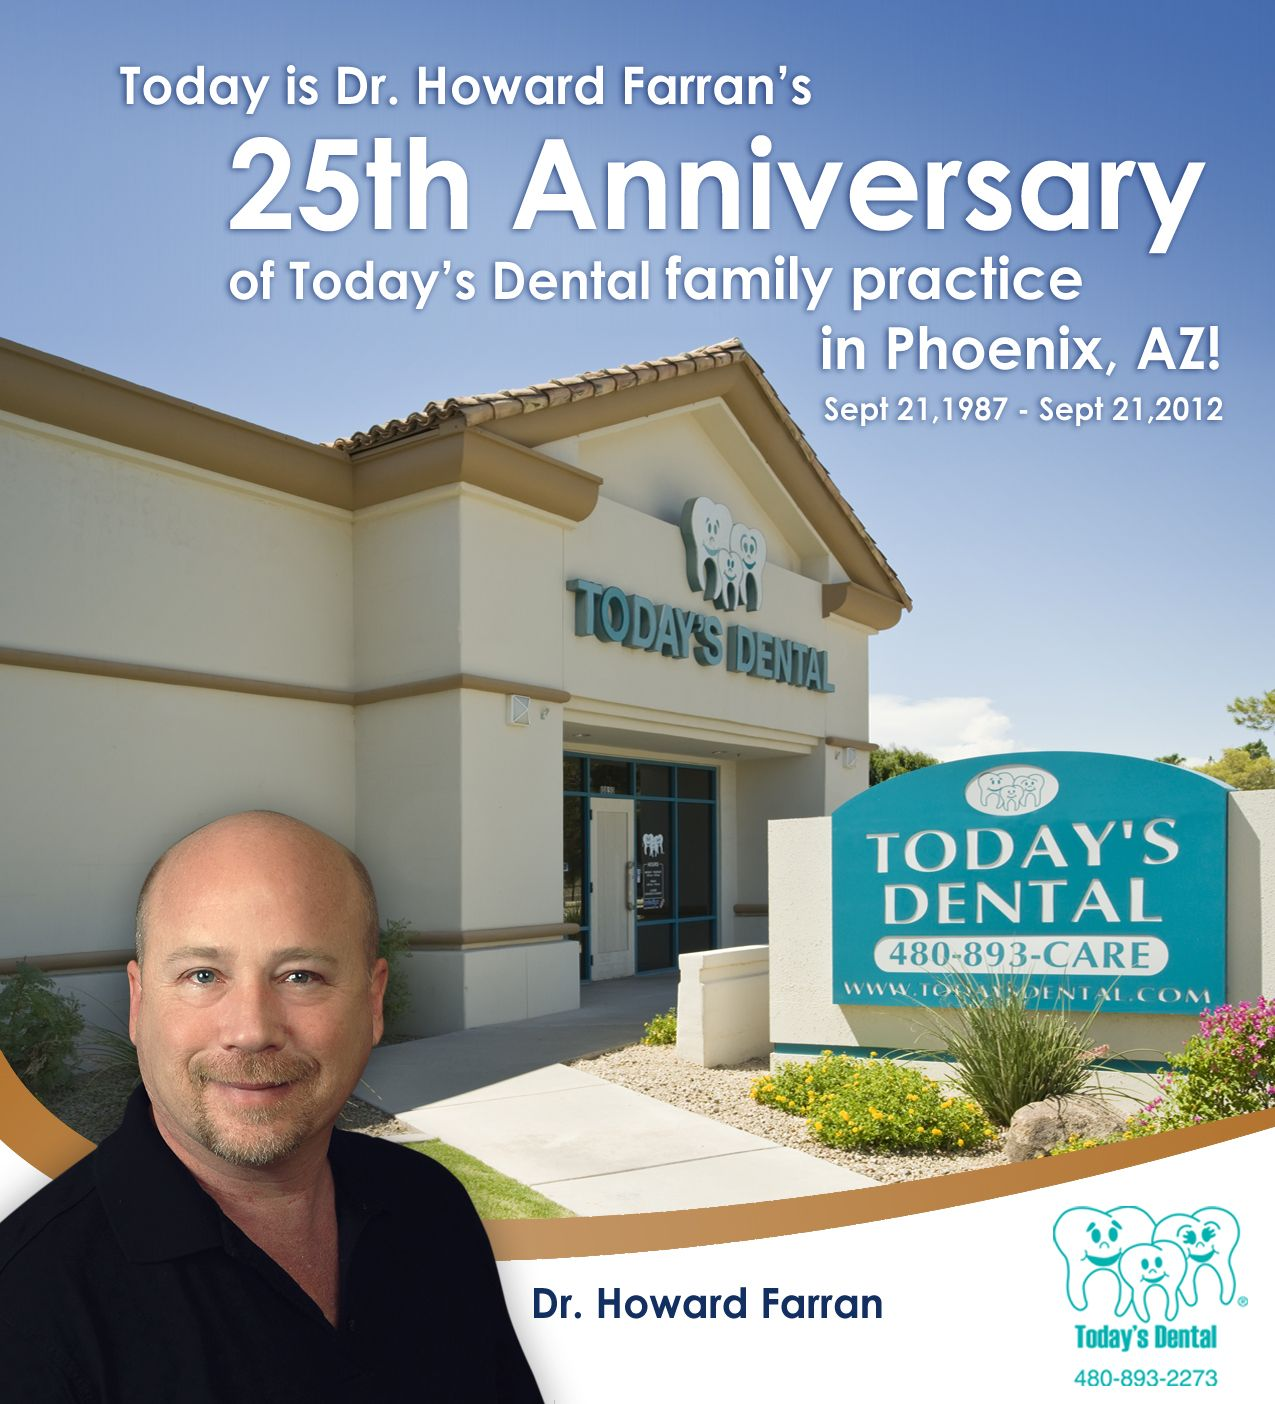 My little Today's Dental office in Phoenix Arizona turns